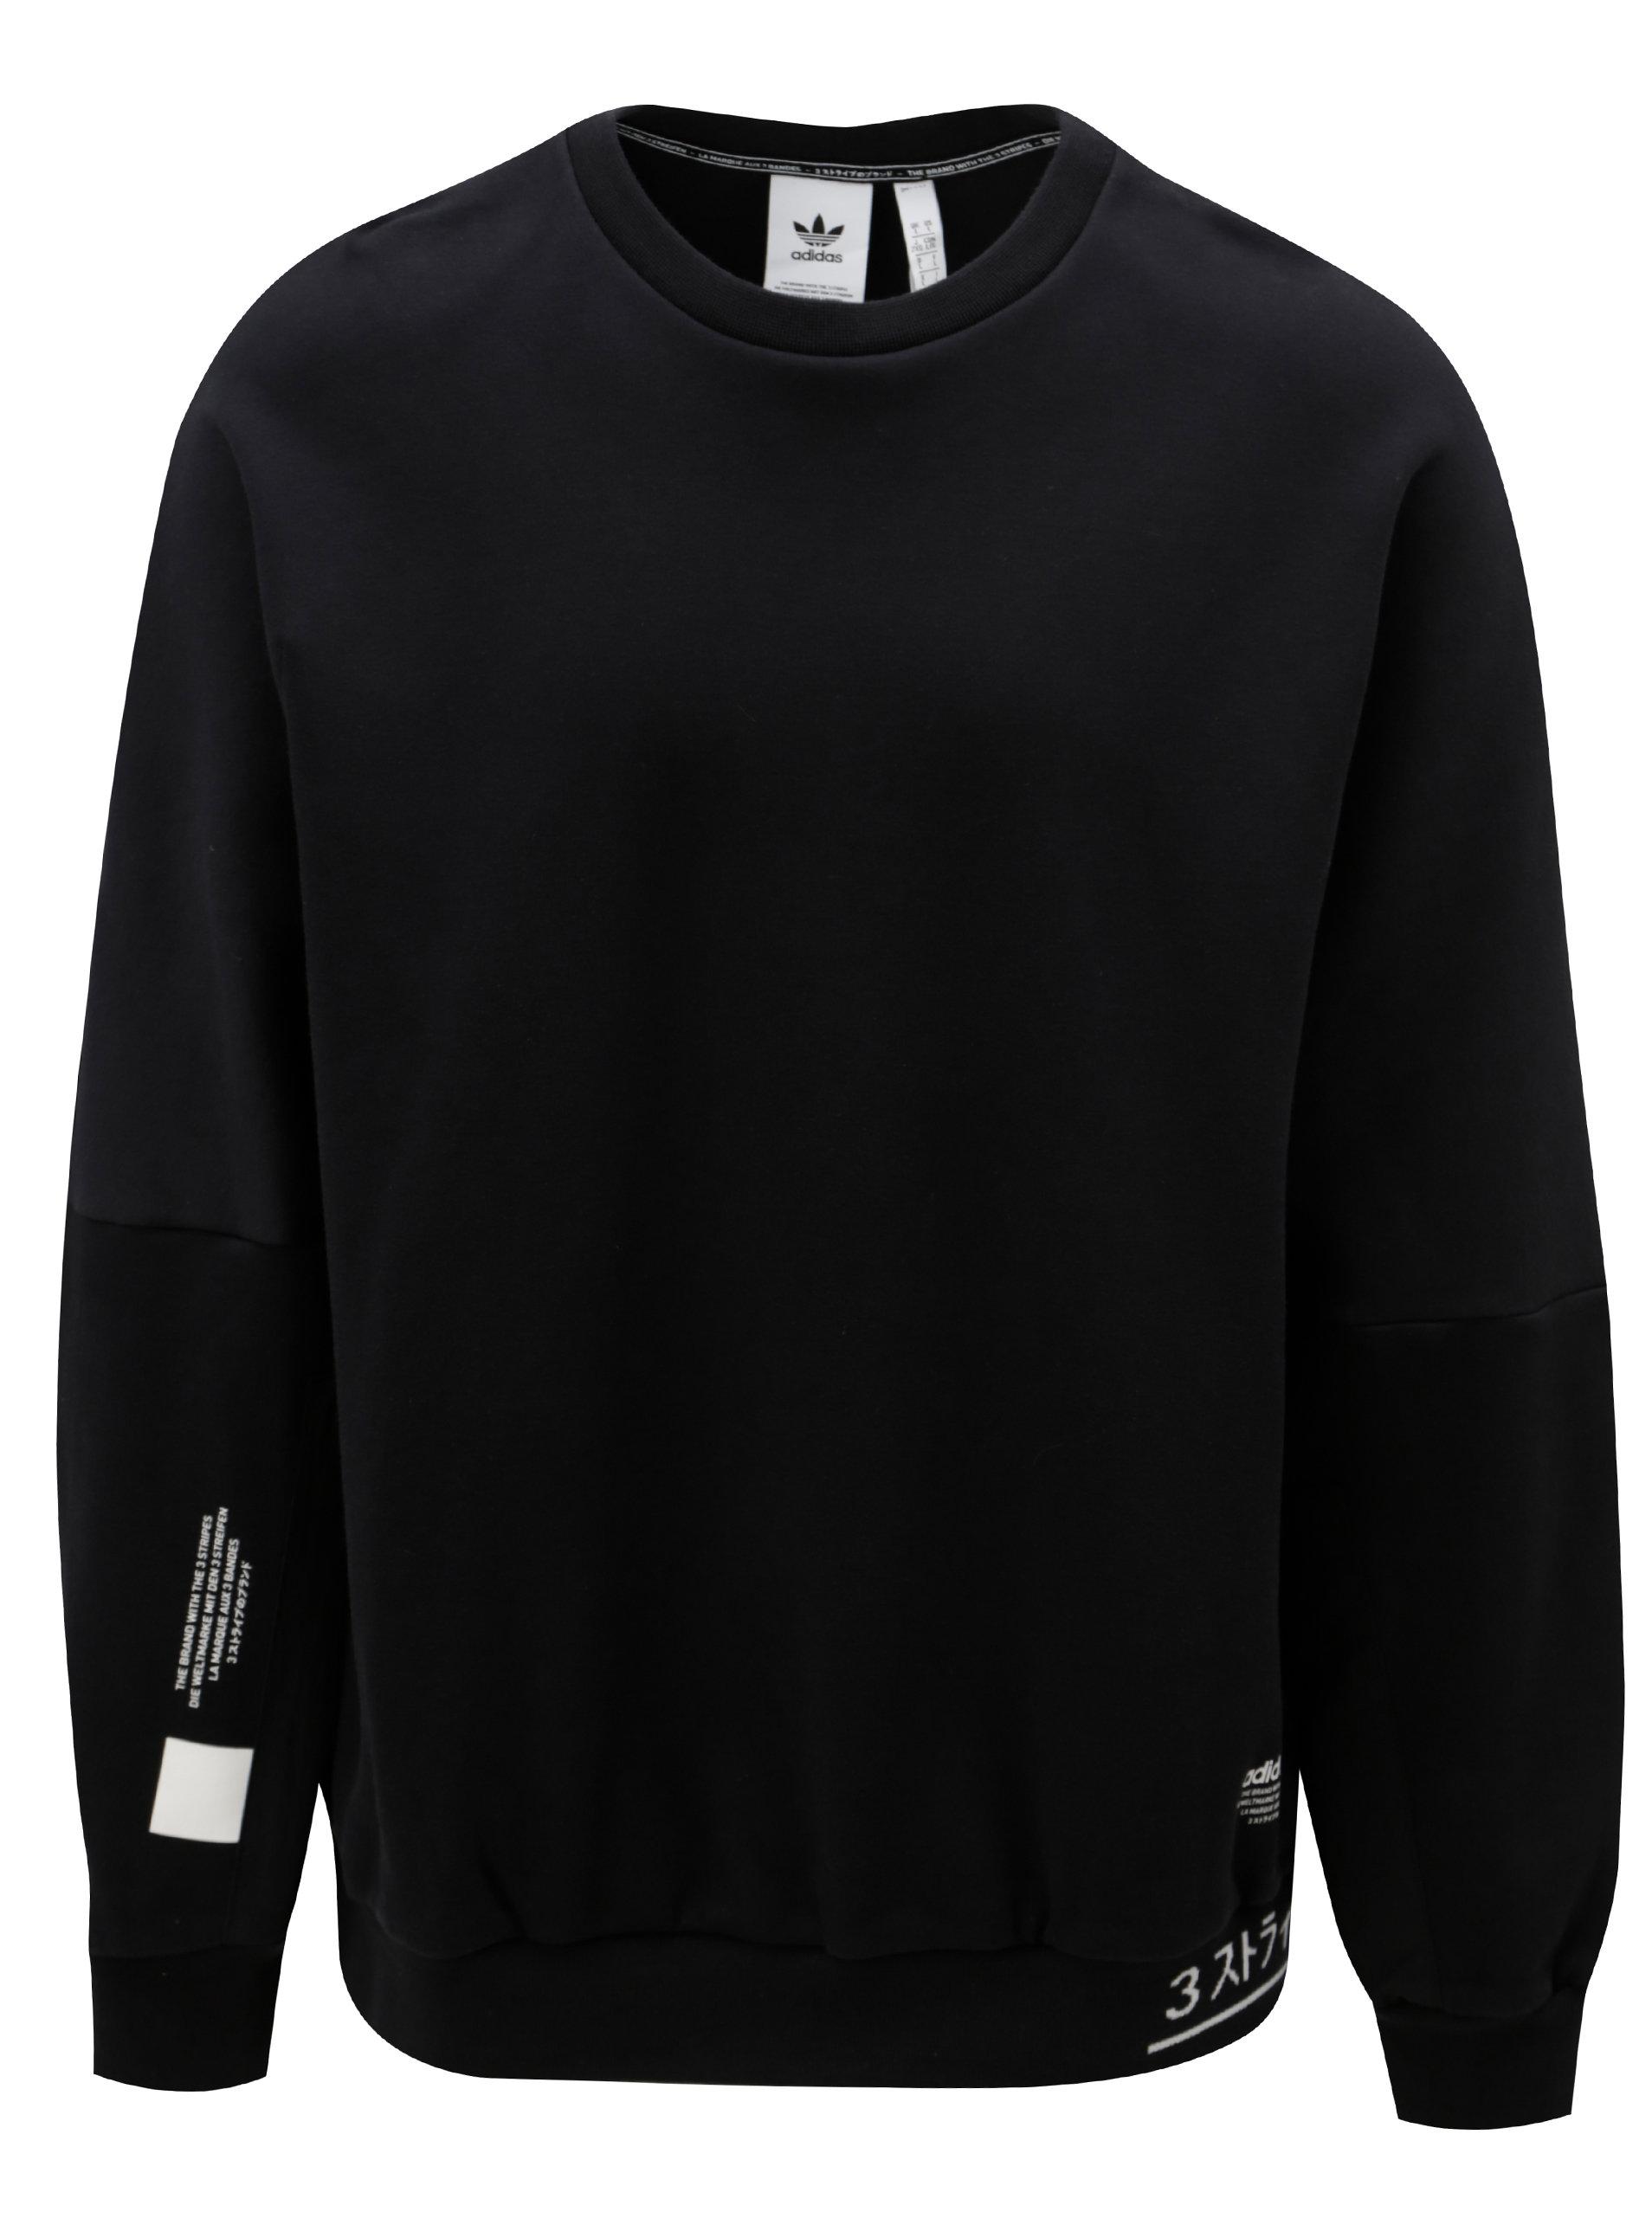 Čierna pánska mikina s potlačou adidas Originals ... 1c0549a3944